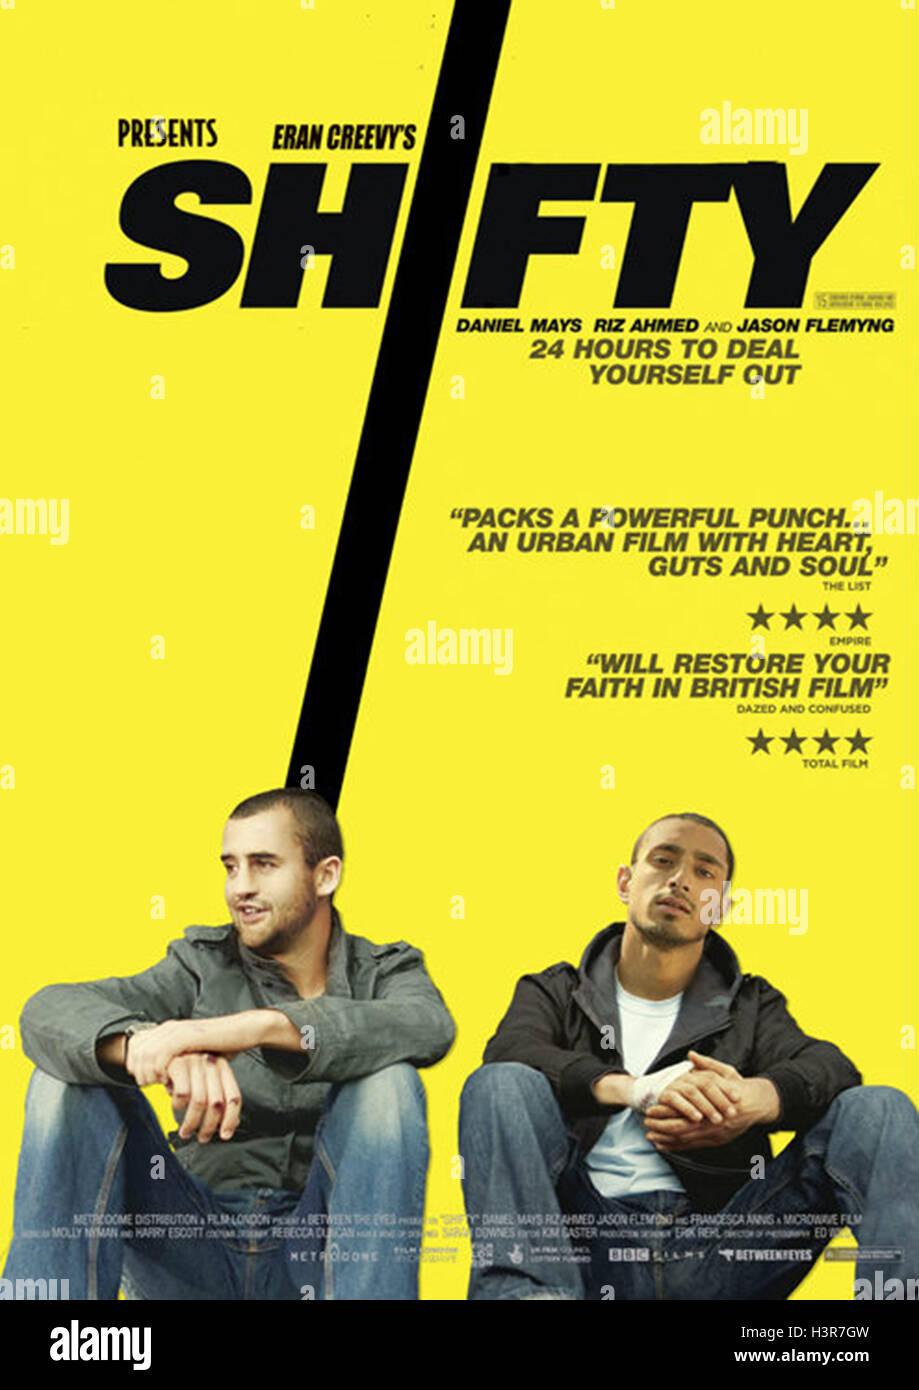 SHIFTY (2008)  DANIEL MAYS  RIZ AHMED  ERAN CREEVY (DIR)  MOVIESTORE COLLECTION LTD - Stock Image